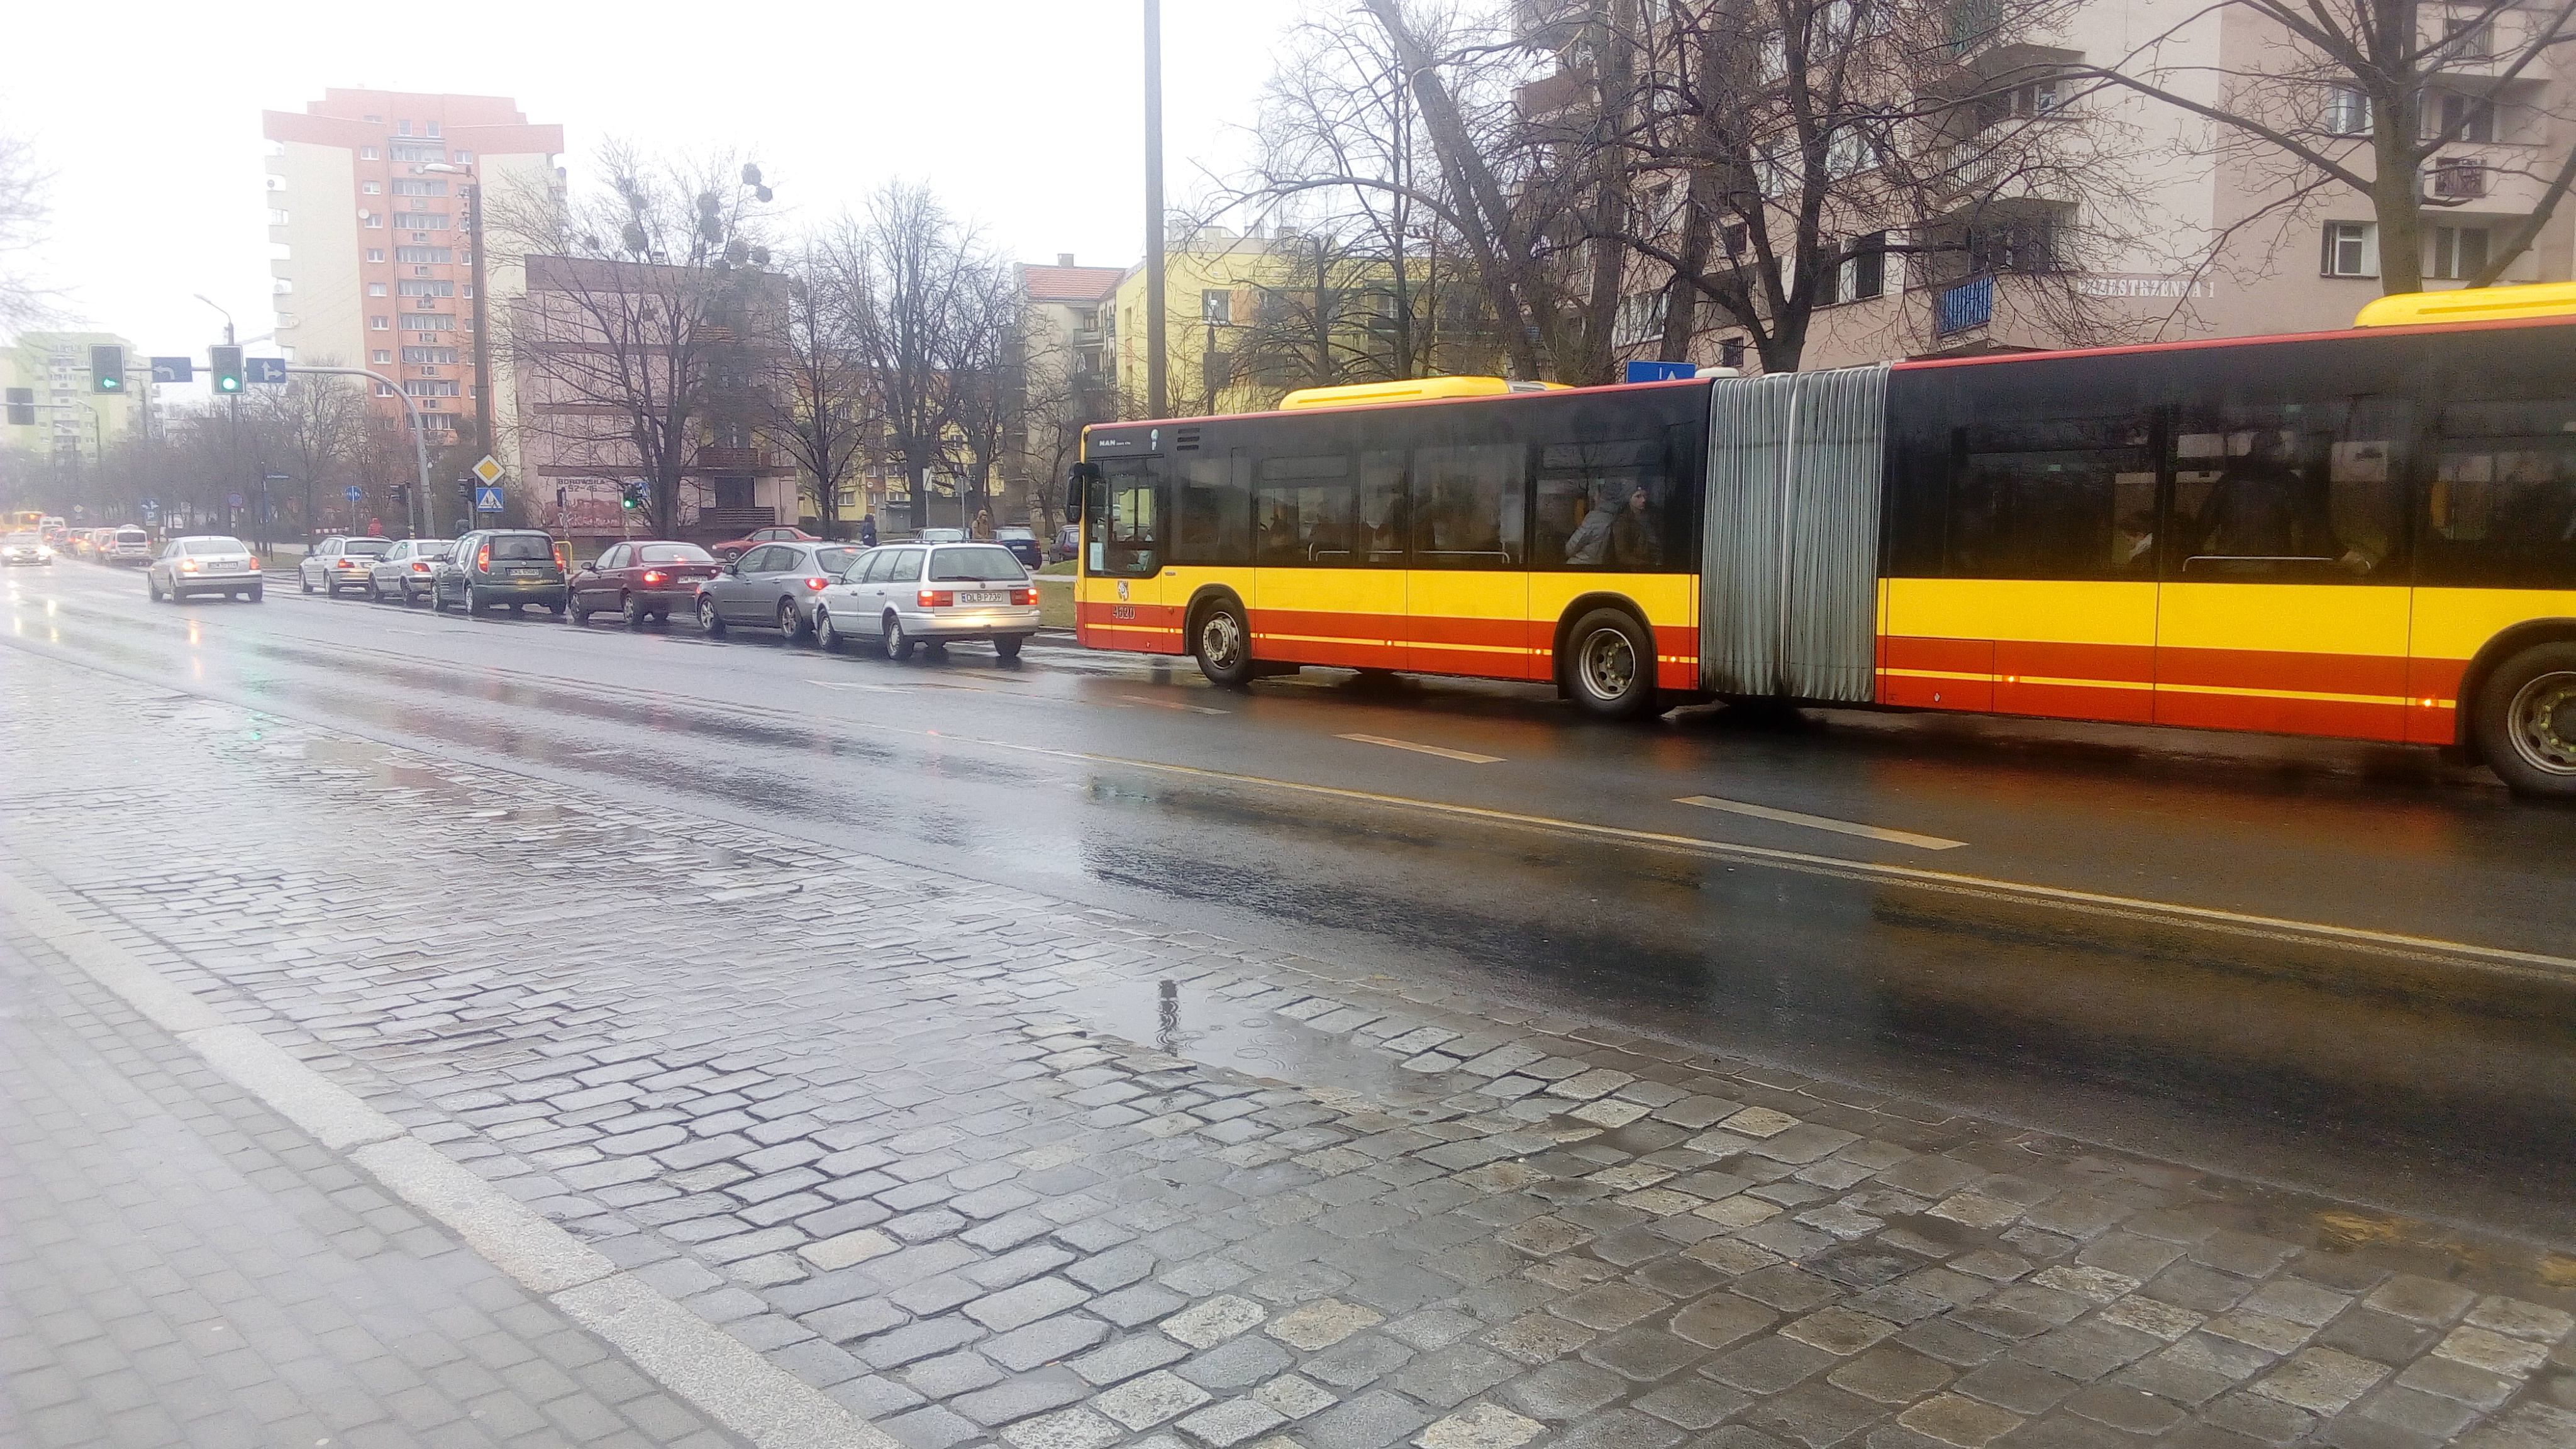 Во Вроцлаве на Каспровича сбили пешехода. Большие пробки